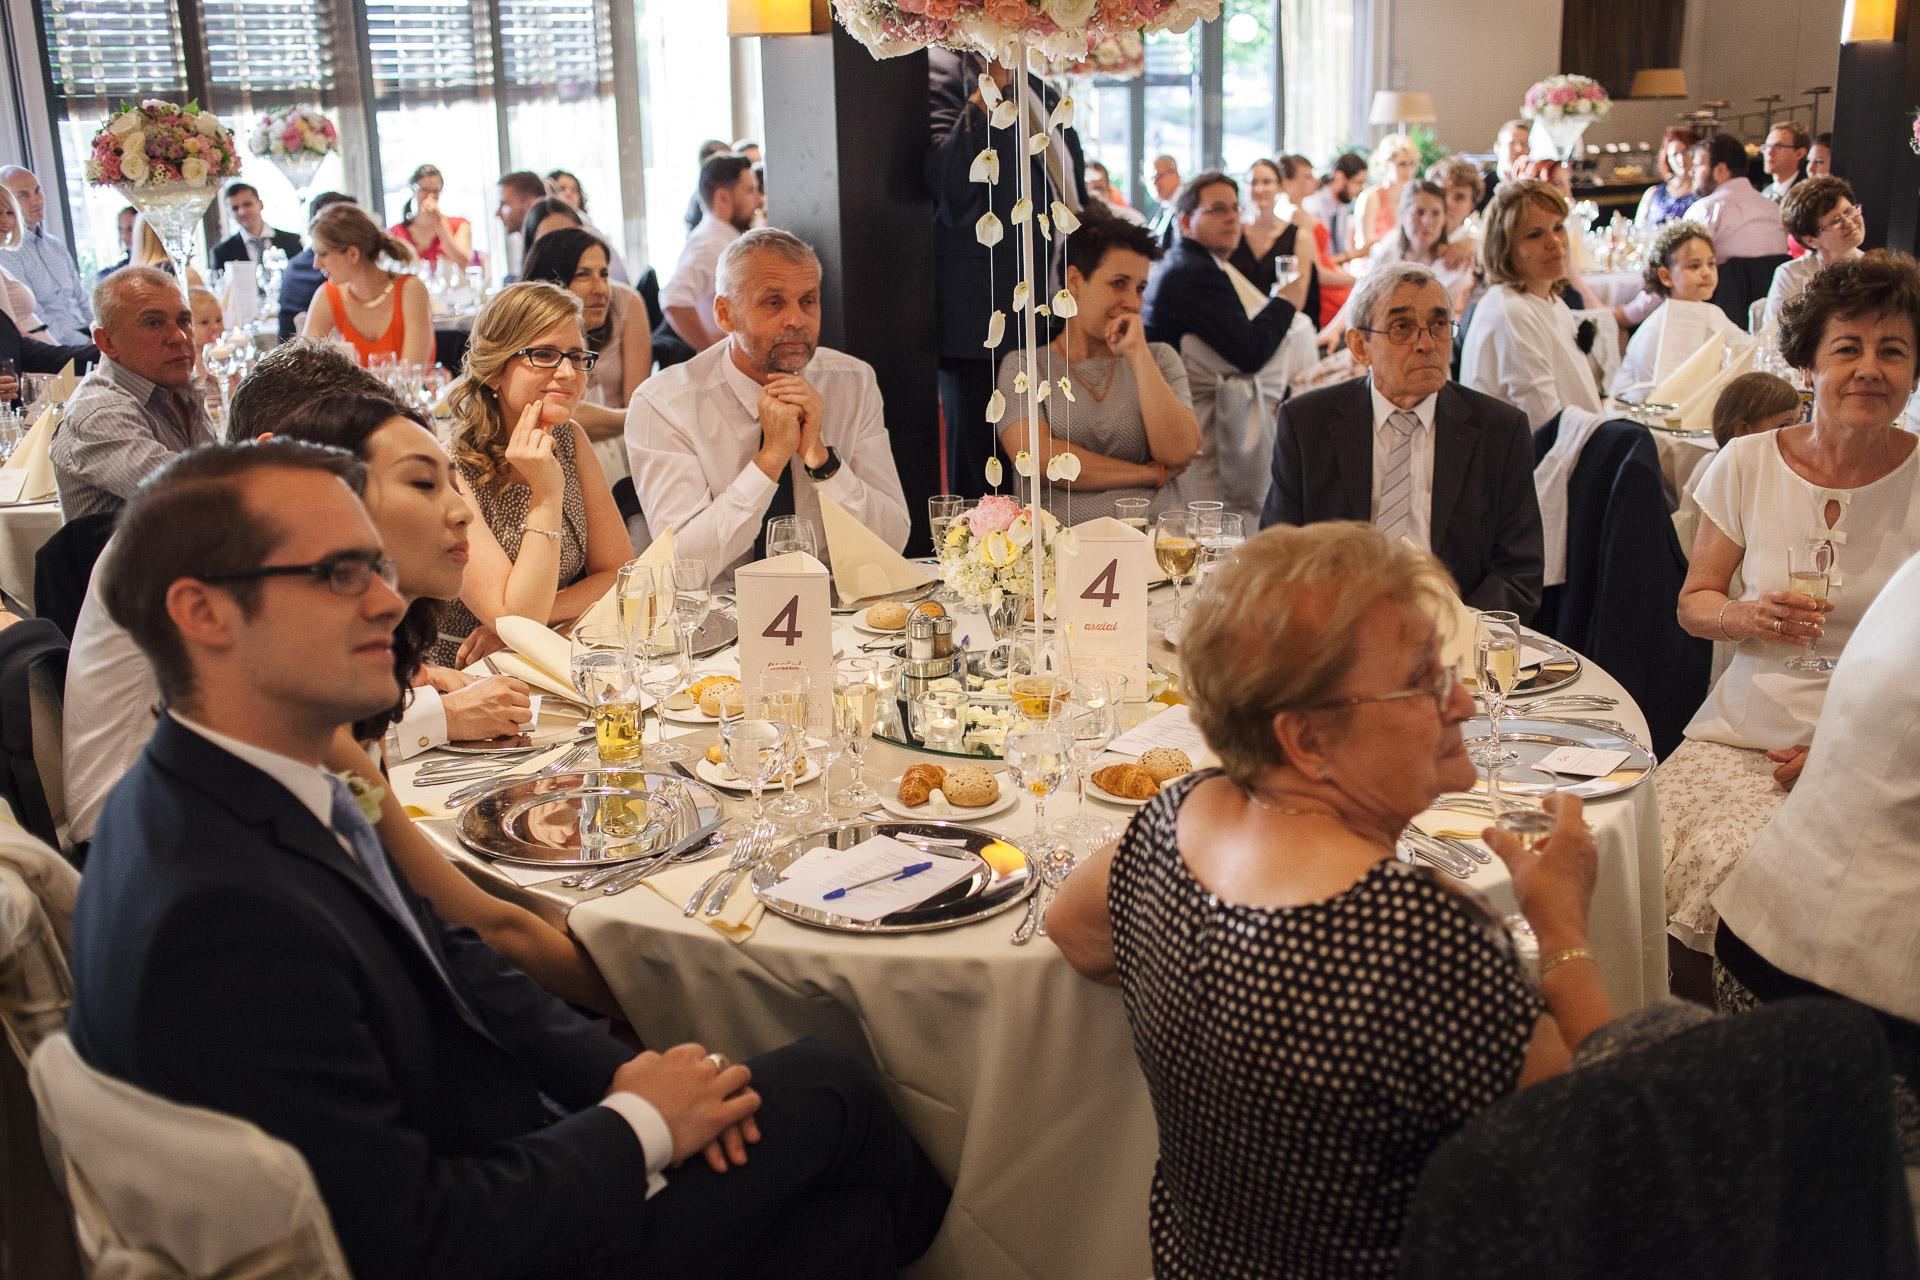 eskuvo_fotozas_wedding_foto_lenart_gabor_sztyui_budapest_IMG_3920